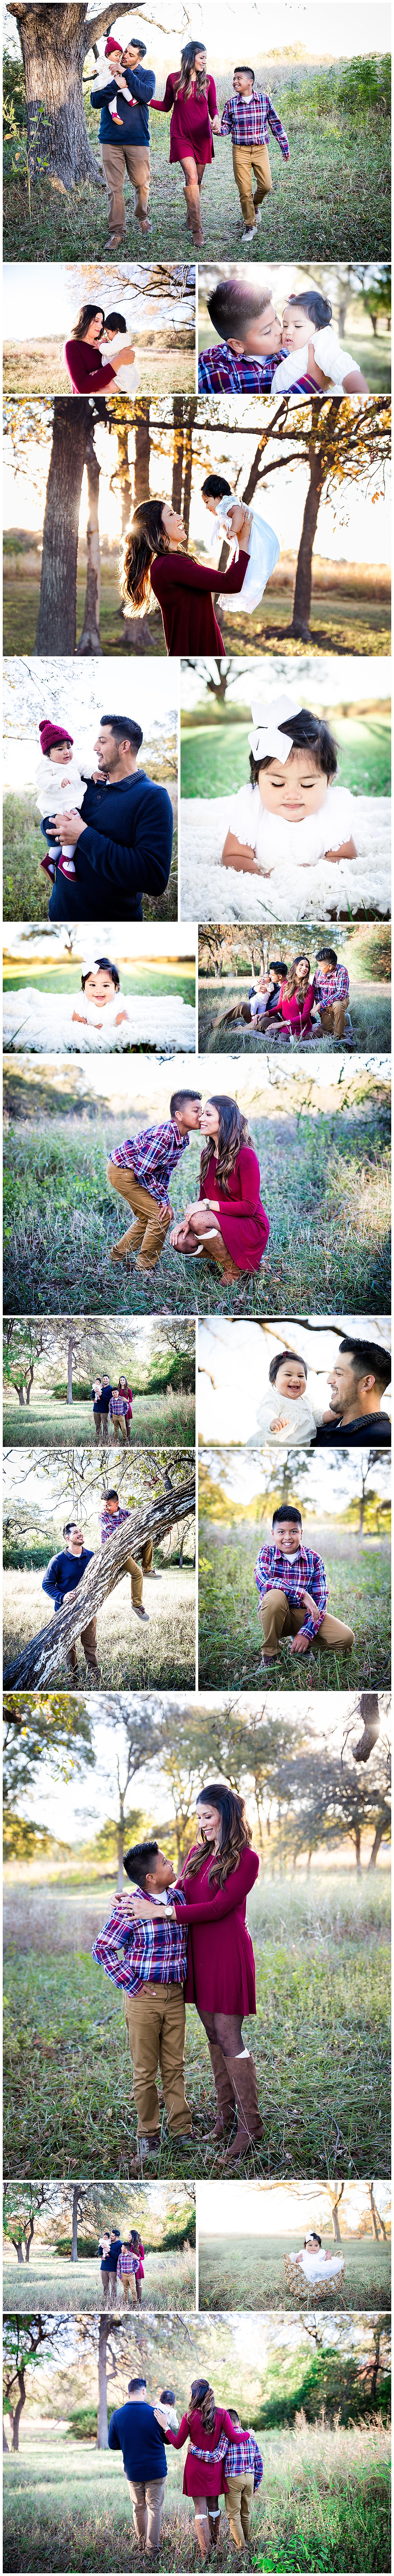 Dallas family photographer, lexi meadows photography, fall family outfit ideas